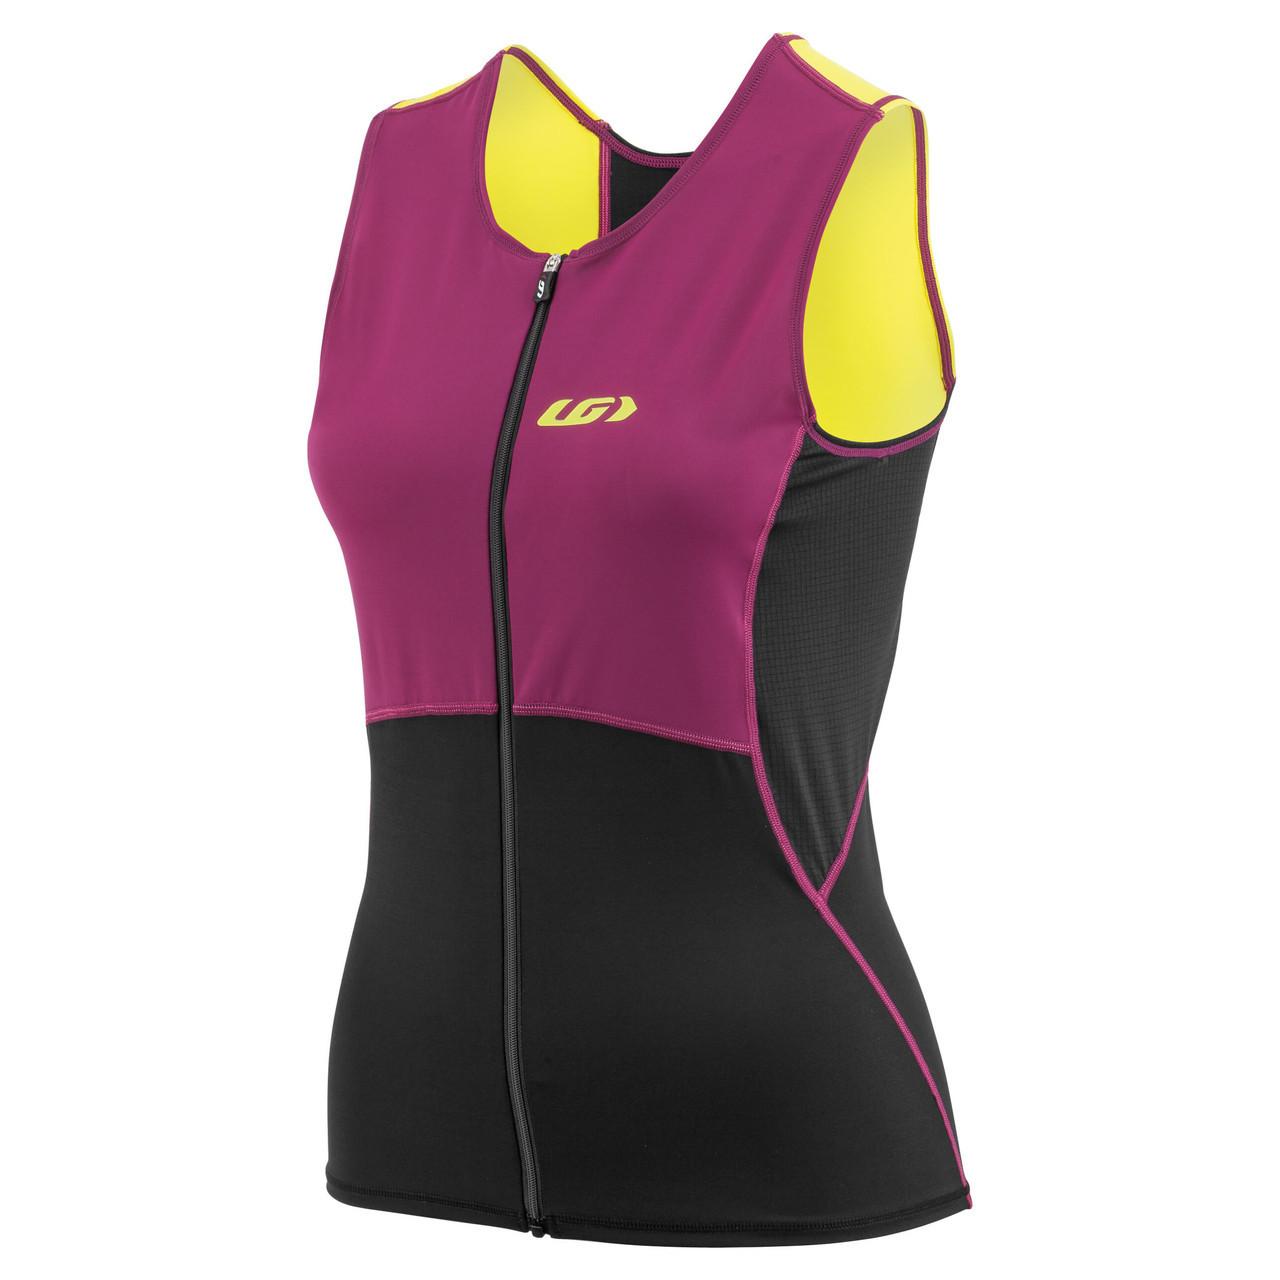 Louis Garneau Women's Comp Sleeveless Tri Top - 2018 price